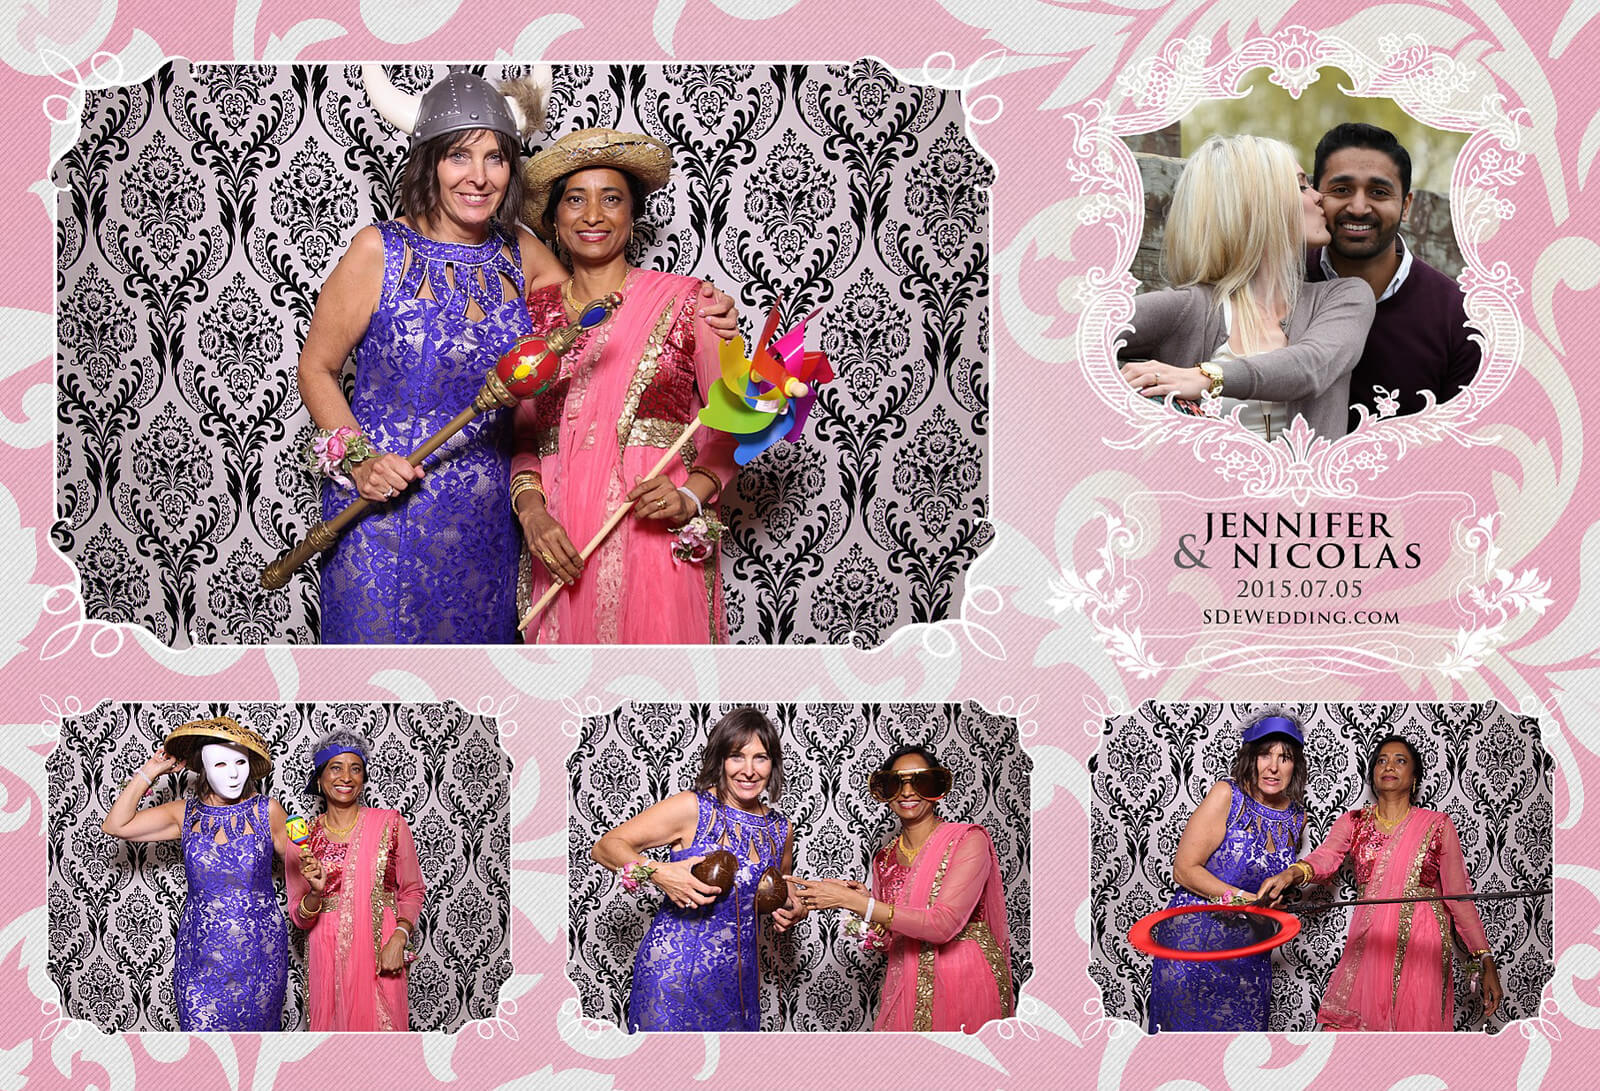 Toronto Liberty Grand Wedding Reception Photo Booth Rental Sde